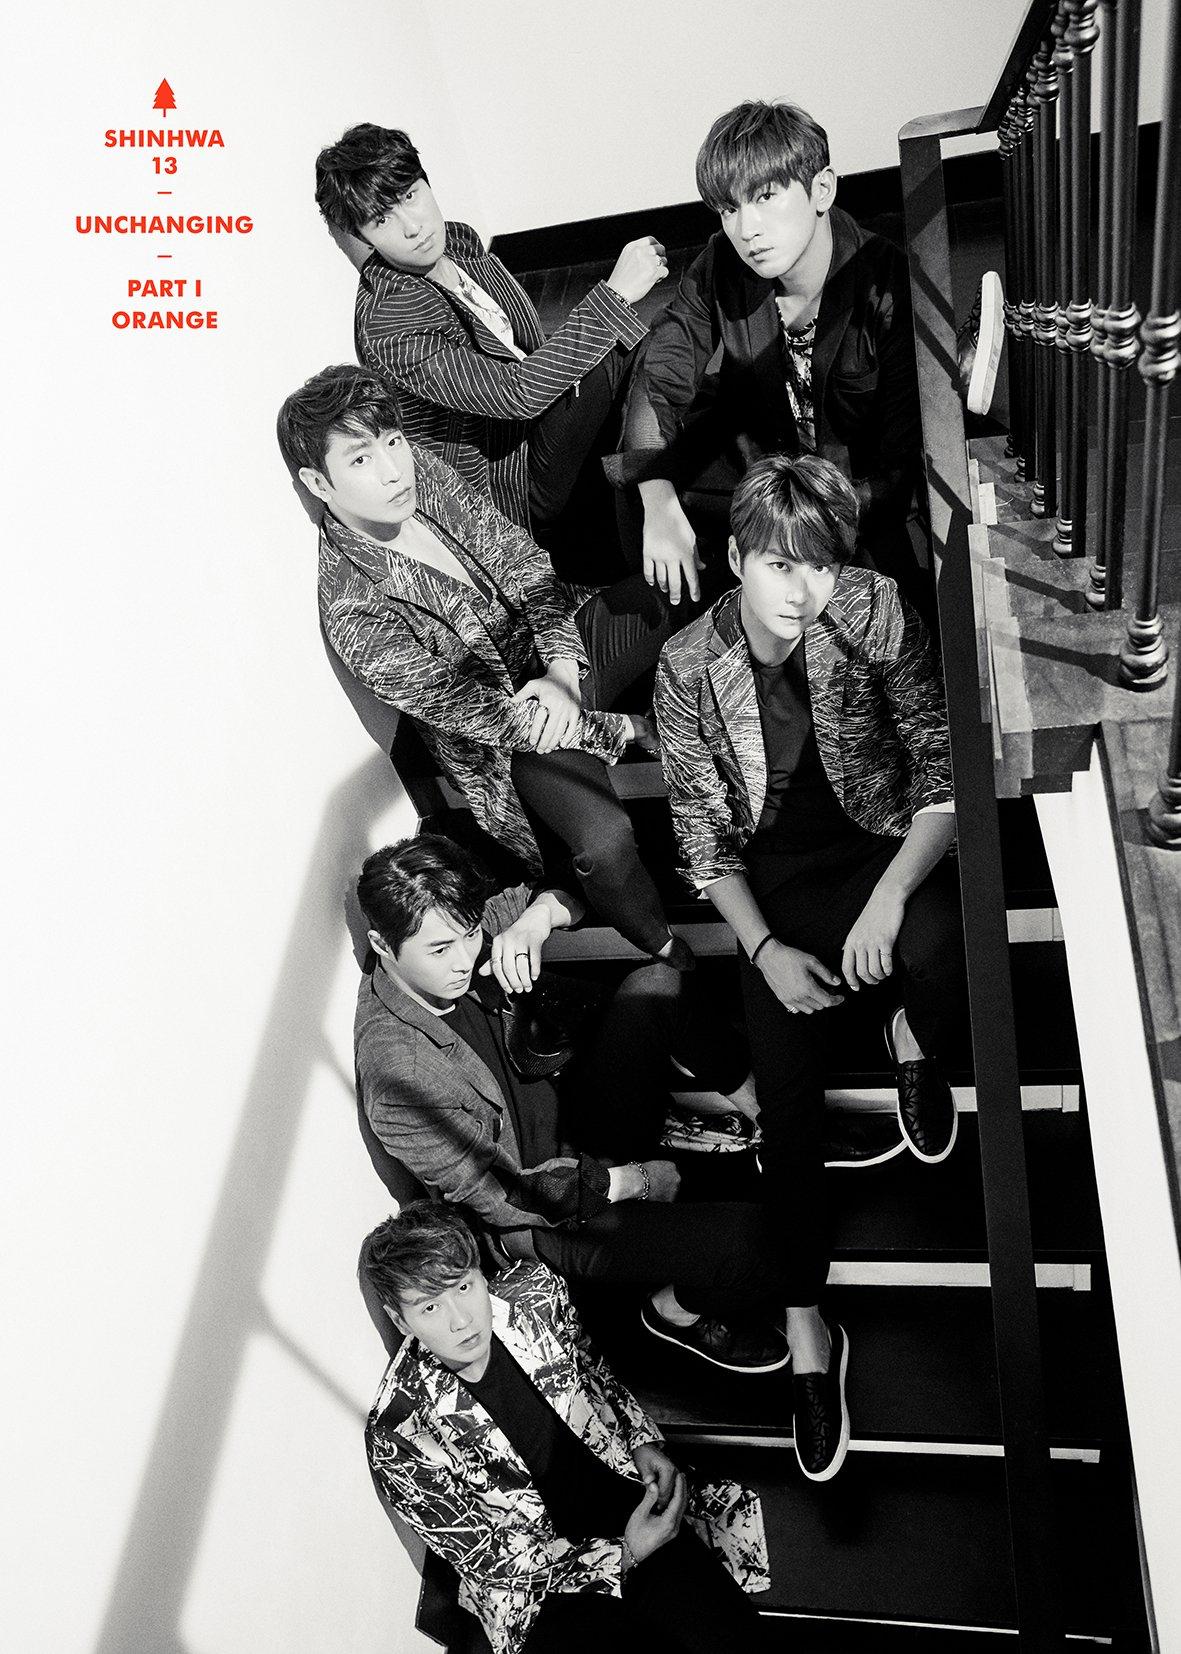 #ShinhwaCompany  네이버 뮤직 스페셜 신화13집 part1 컴백포토 단독 공개 (신화/에릭/민우)  언제나 우리 곁에...  변하지 않는 단 하나 '신화'